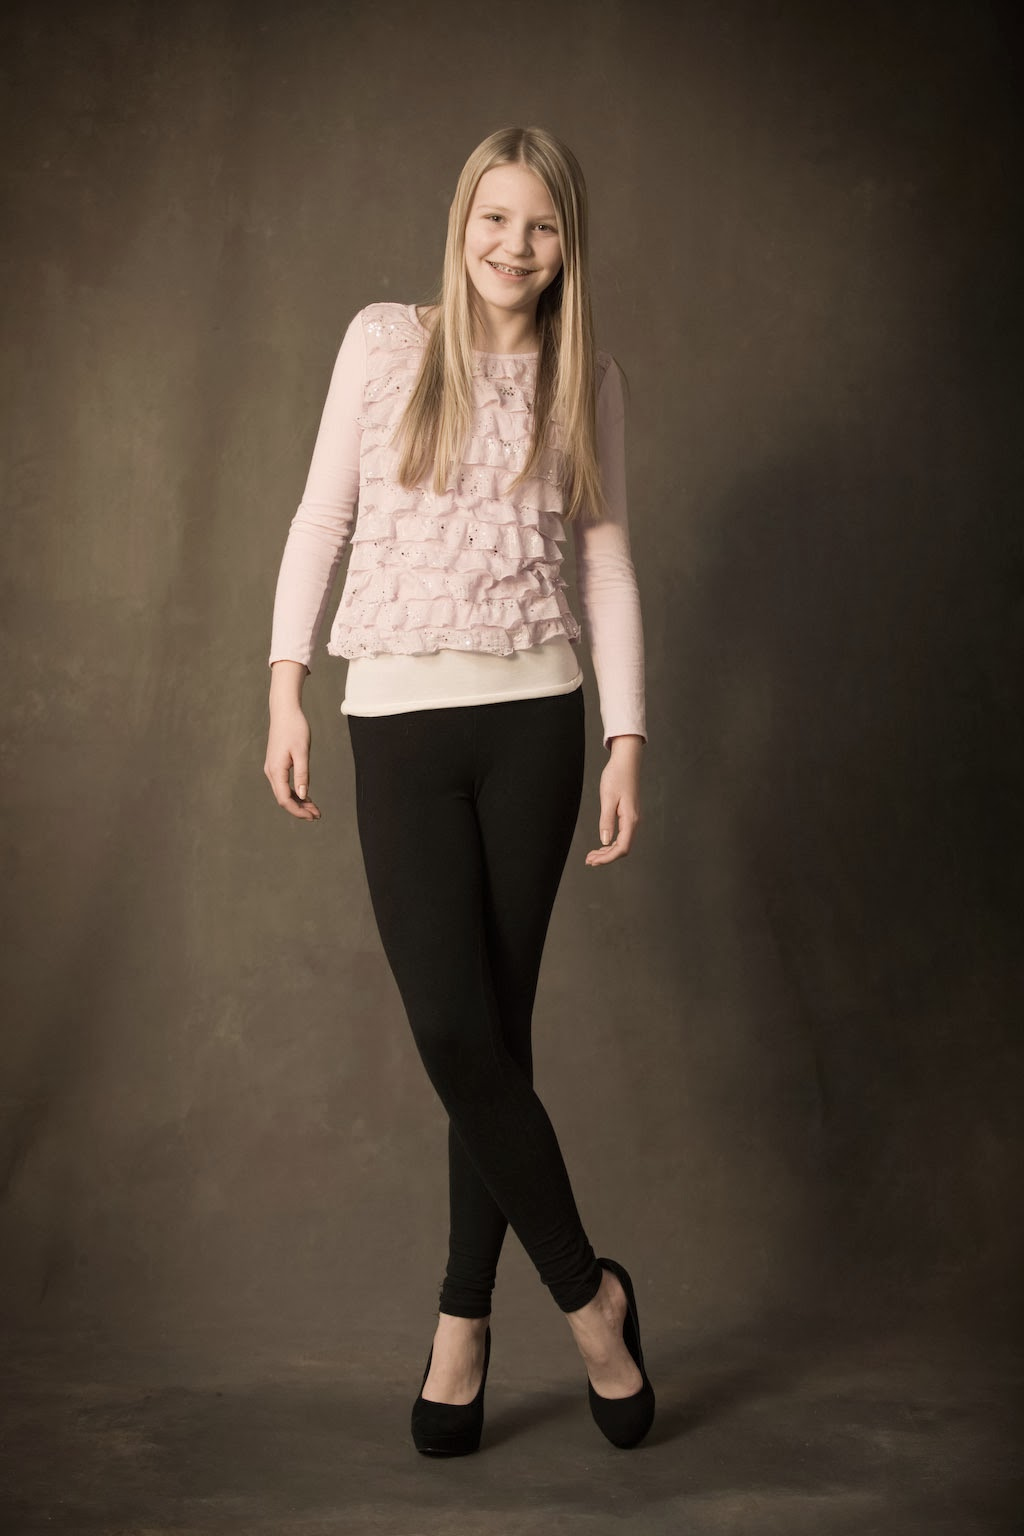 Olivia Holt - Olivia Holt Photos - Teen Vogue Young